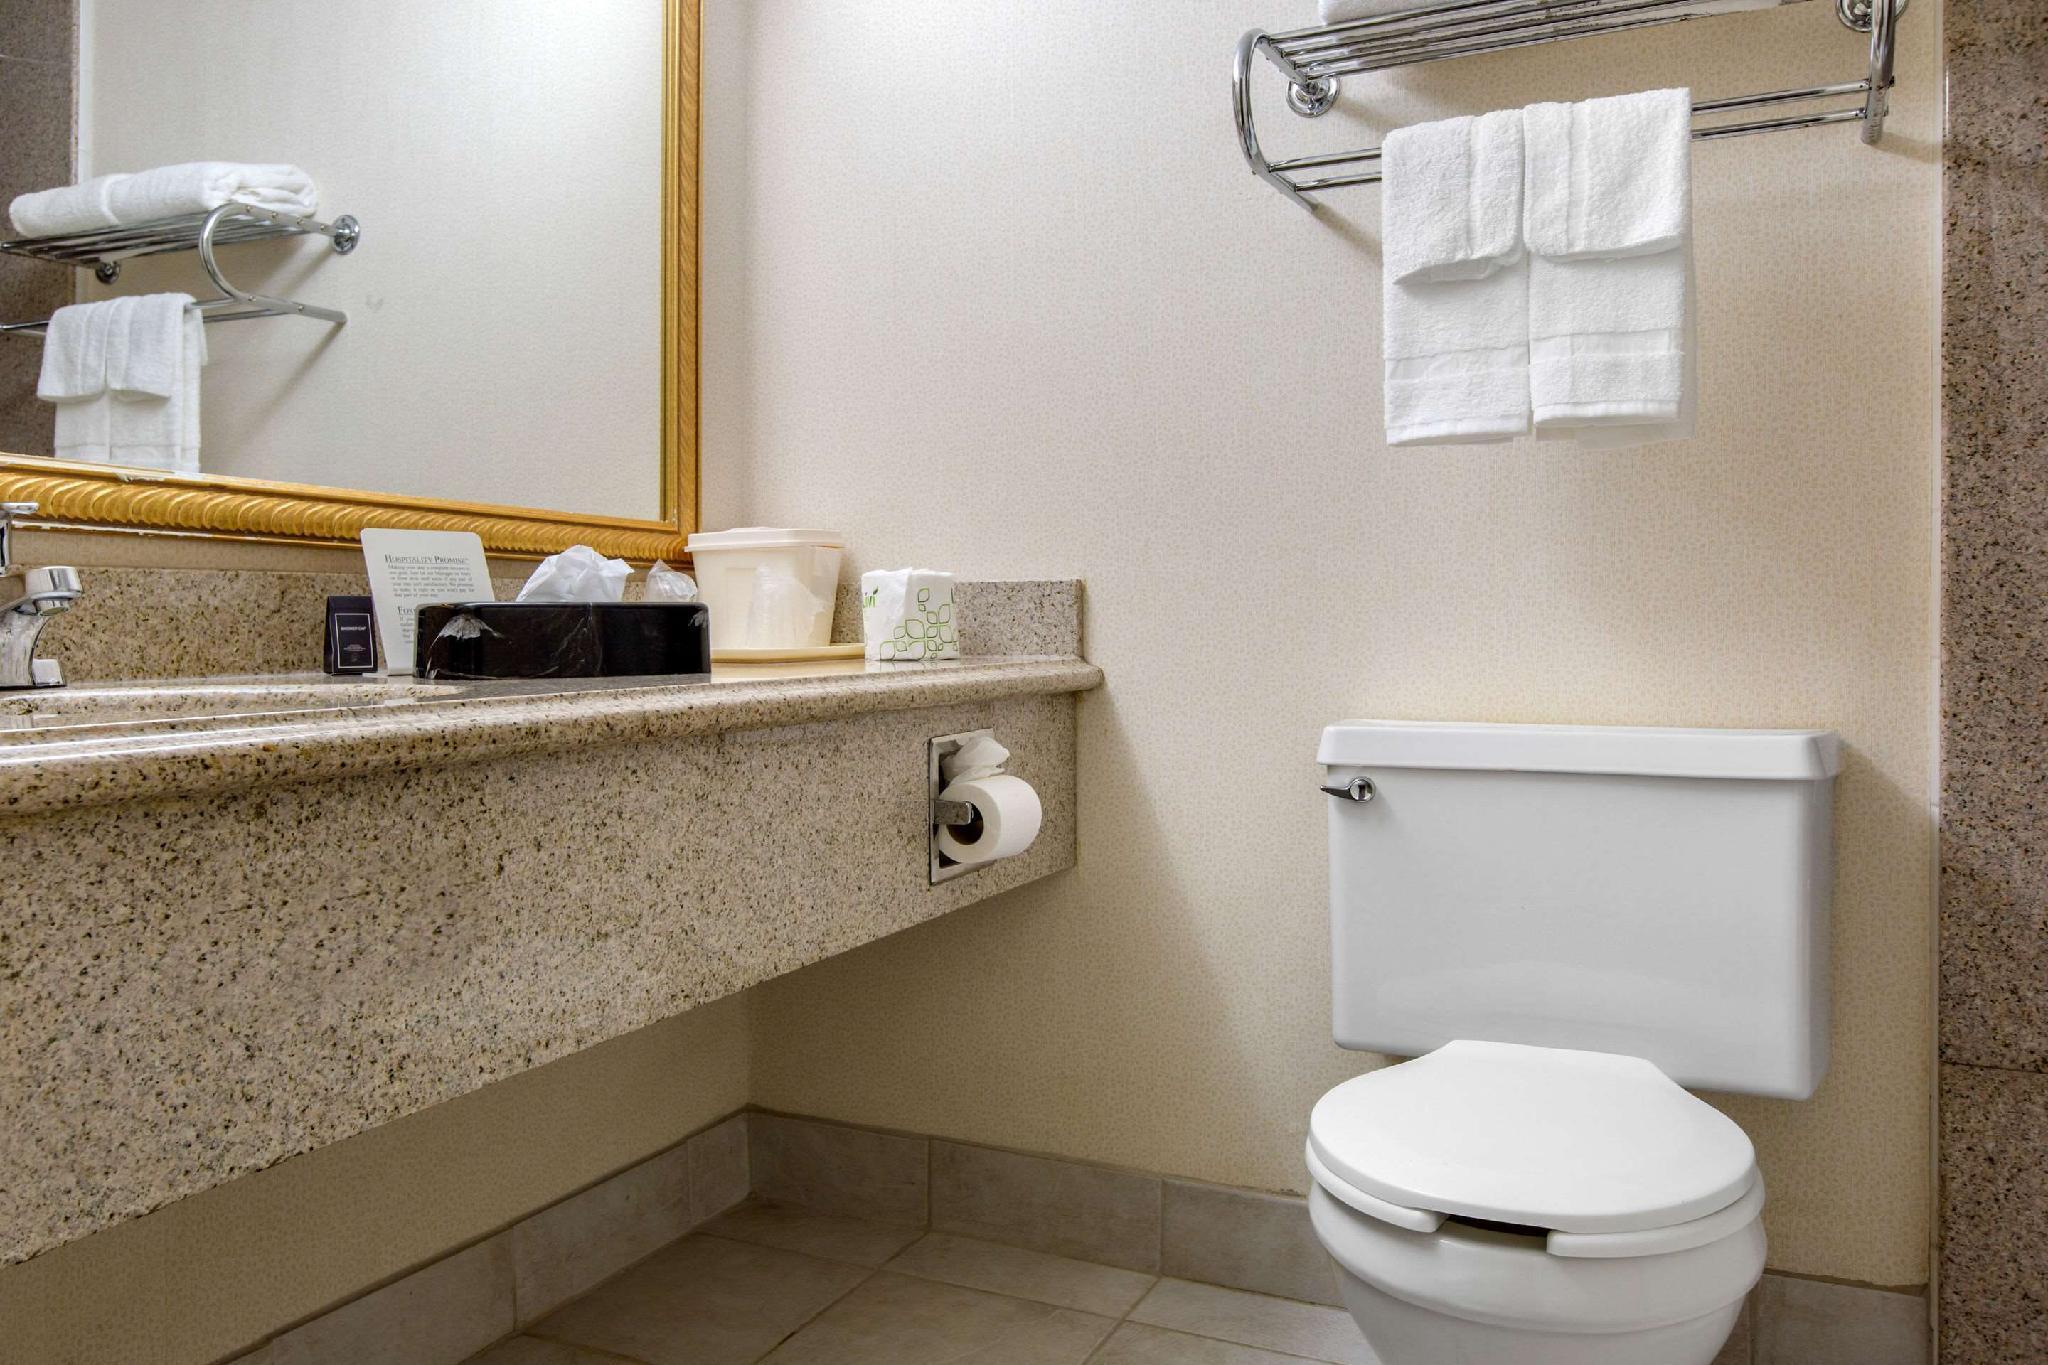 Quality Inn Hotel (Roxbury Township (NJ)) - Deals, Photos